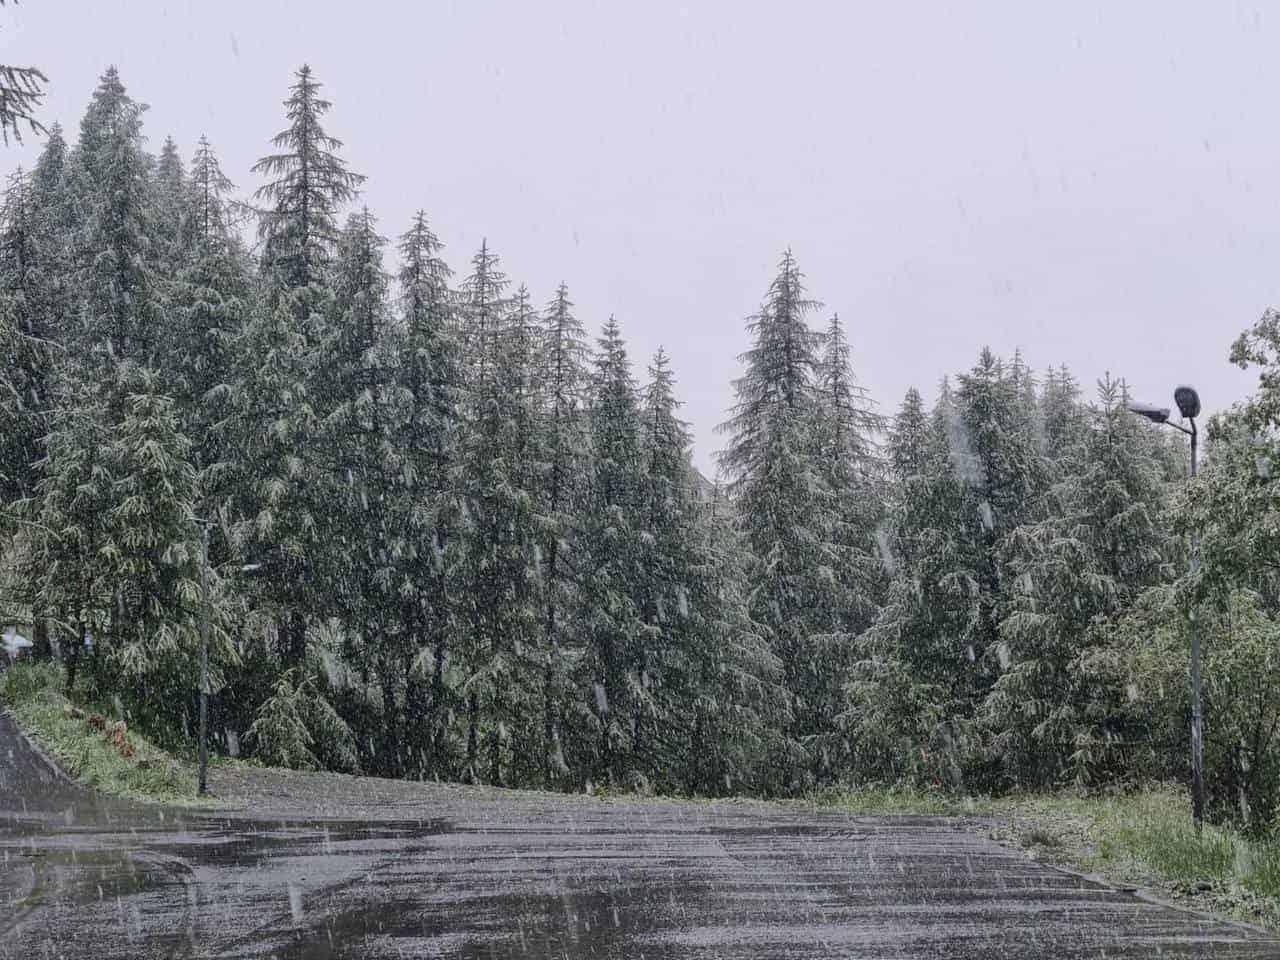 217673944 1000044154132257 7812790481472400171 n - Meteo Valle d'Aosta, la neve imbianca Cervinia in pieno luglio